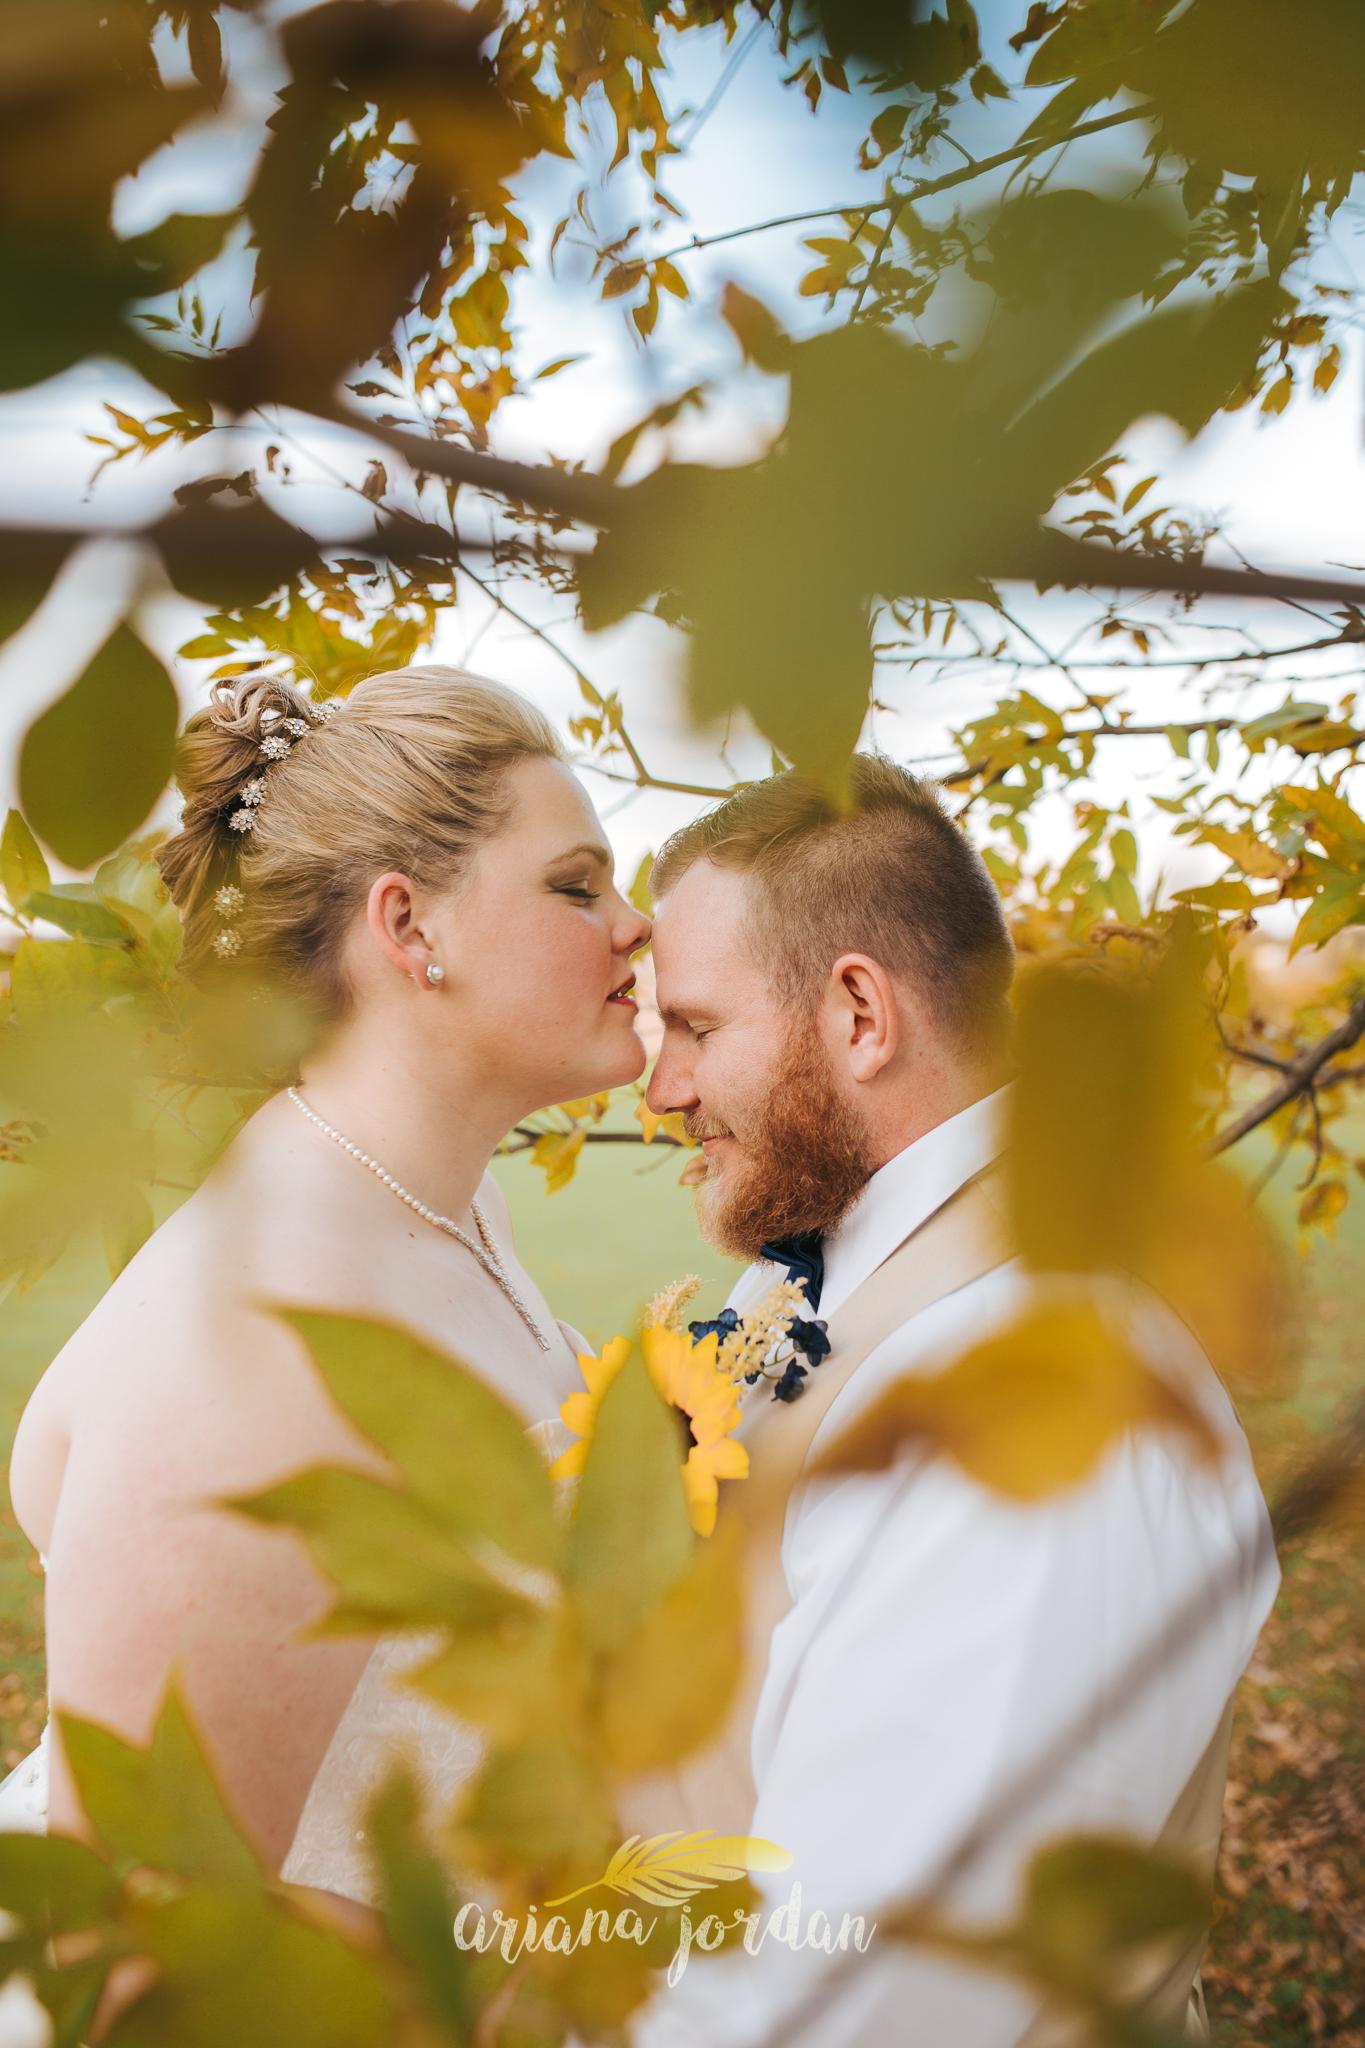 0087 Ariana Jordan Photography - Georgetown KY Wedding Photographer 8813.jpg